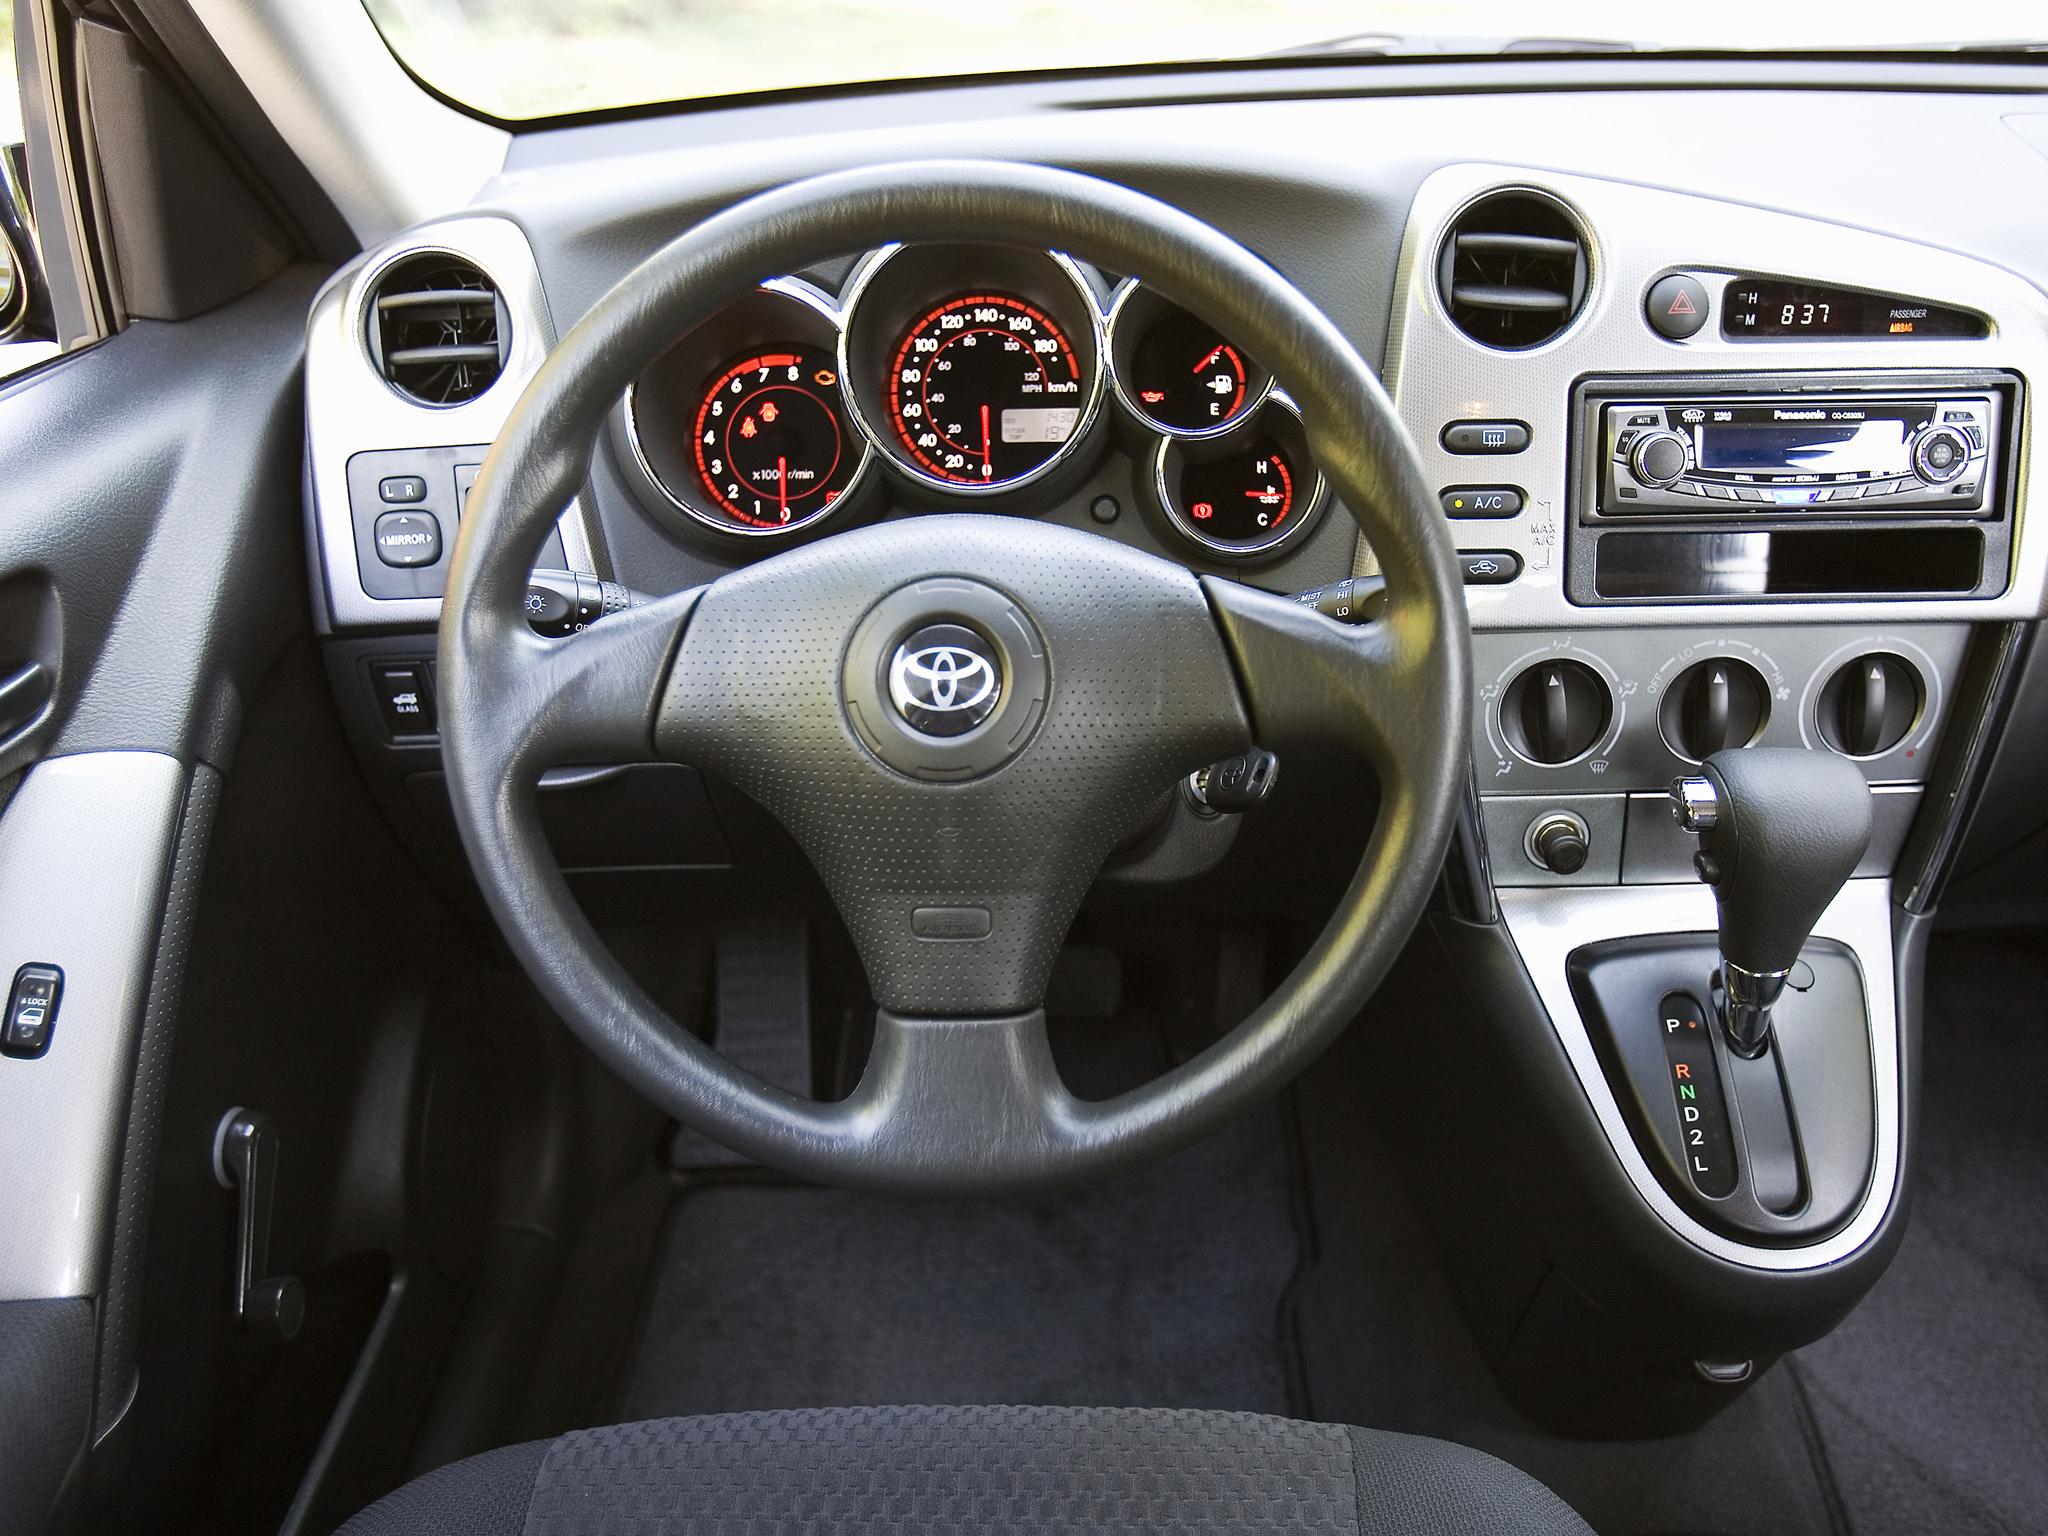 2004 Toyota Matrix Image 8